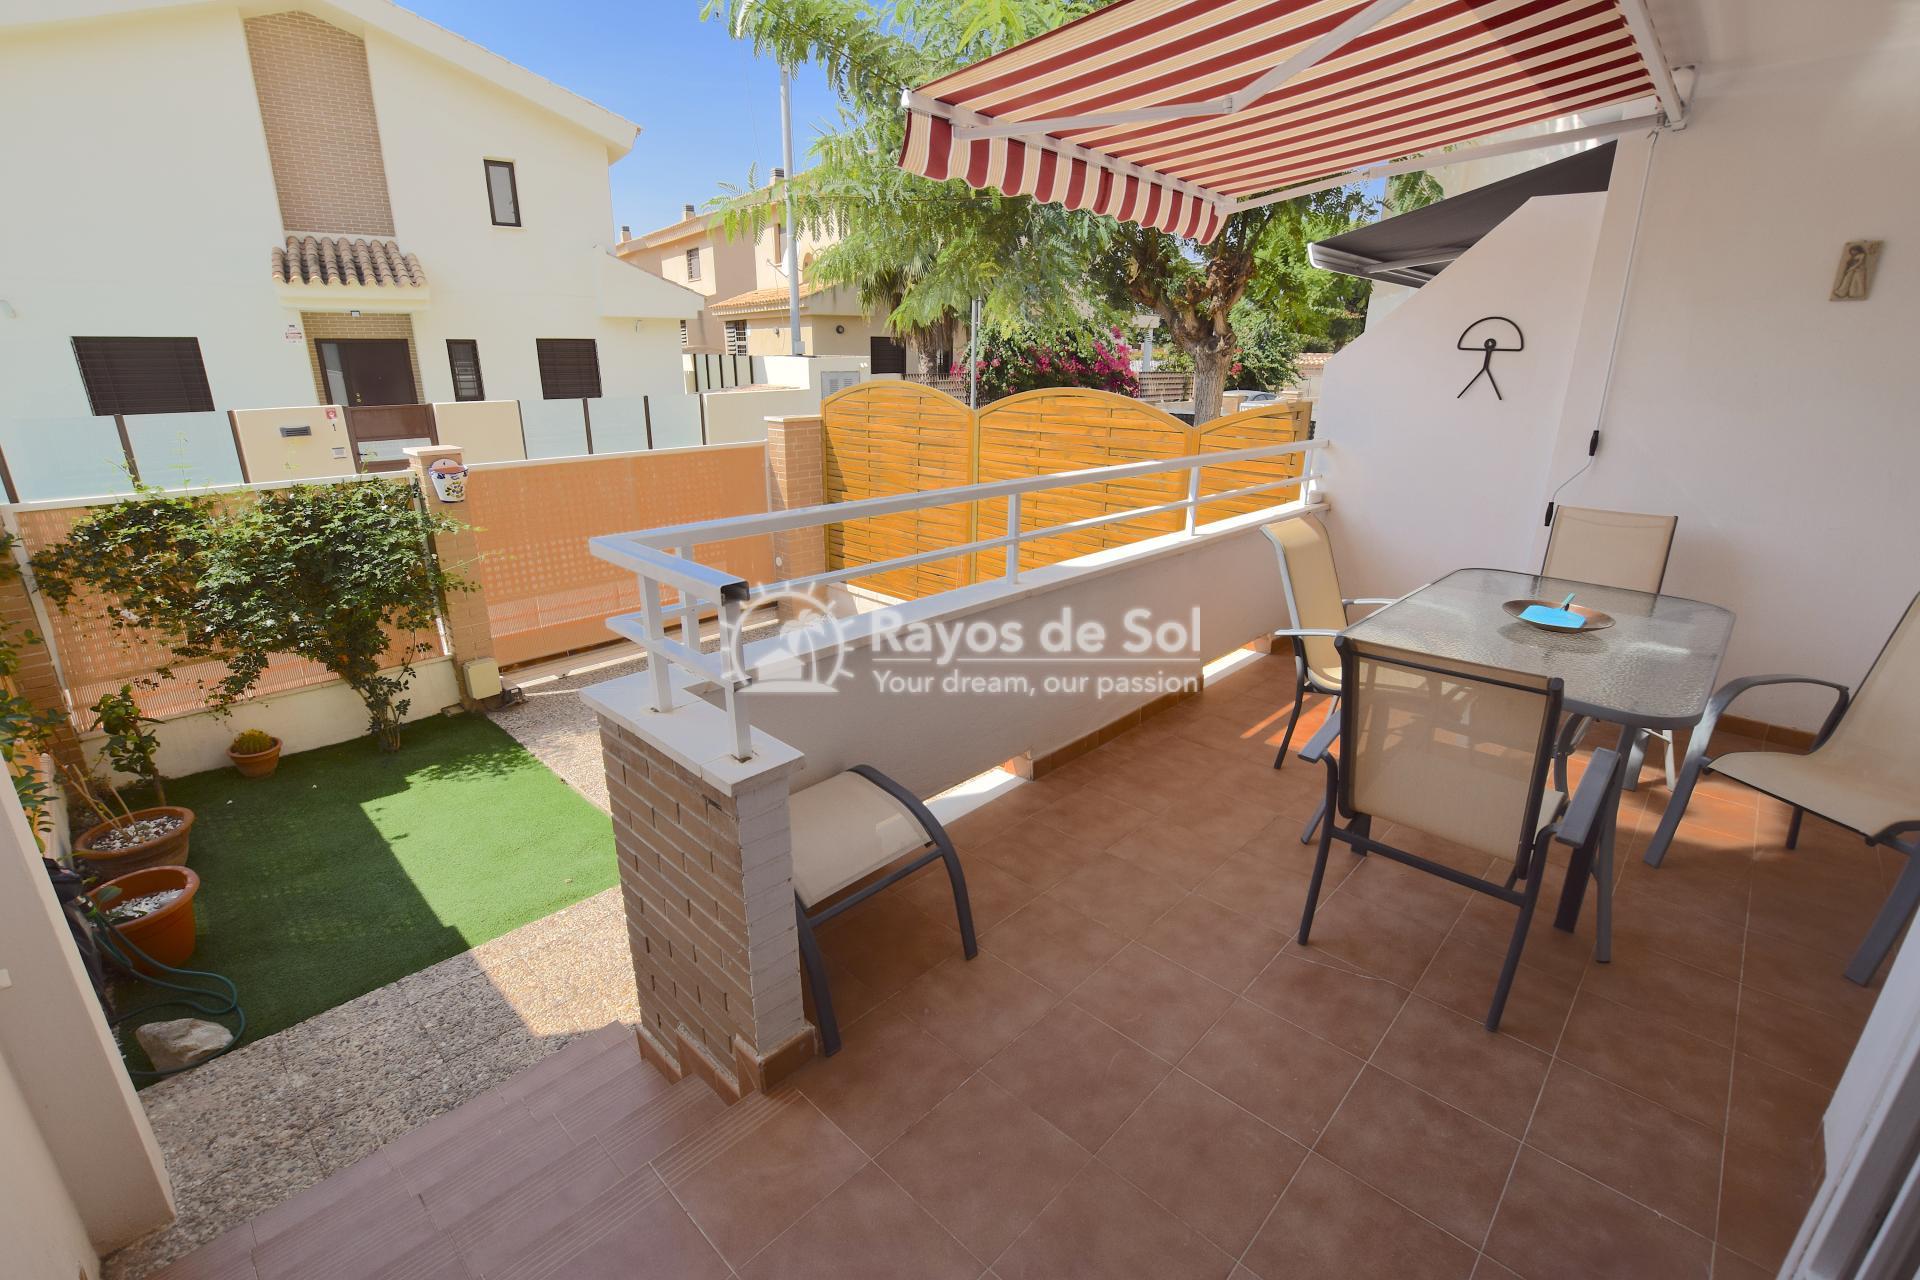 Appartement met zuidwest oriëntatie  in San Cayetano, Costa Cálida (SCRE0055) - 19